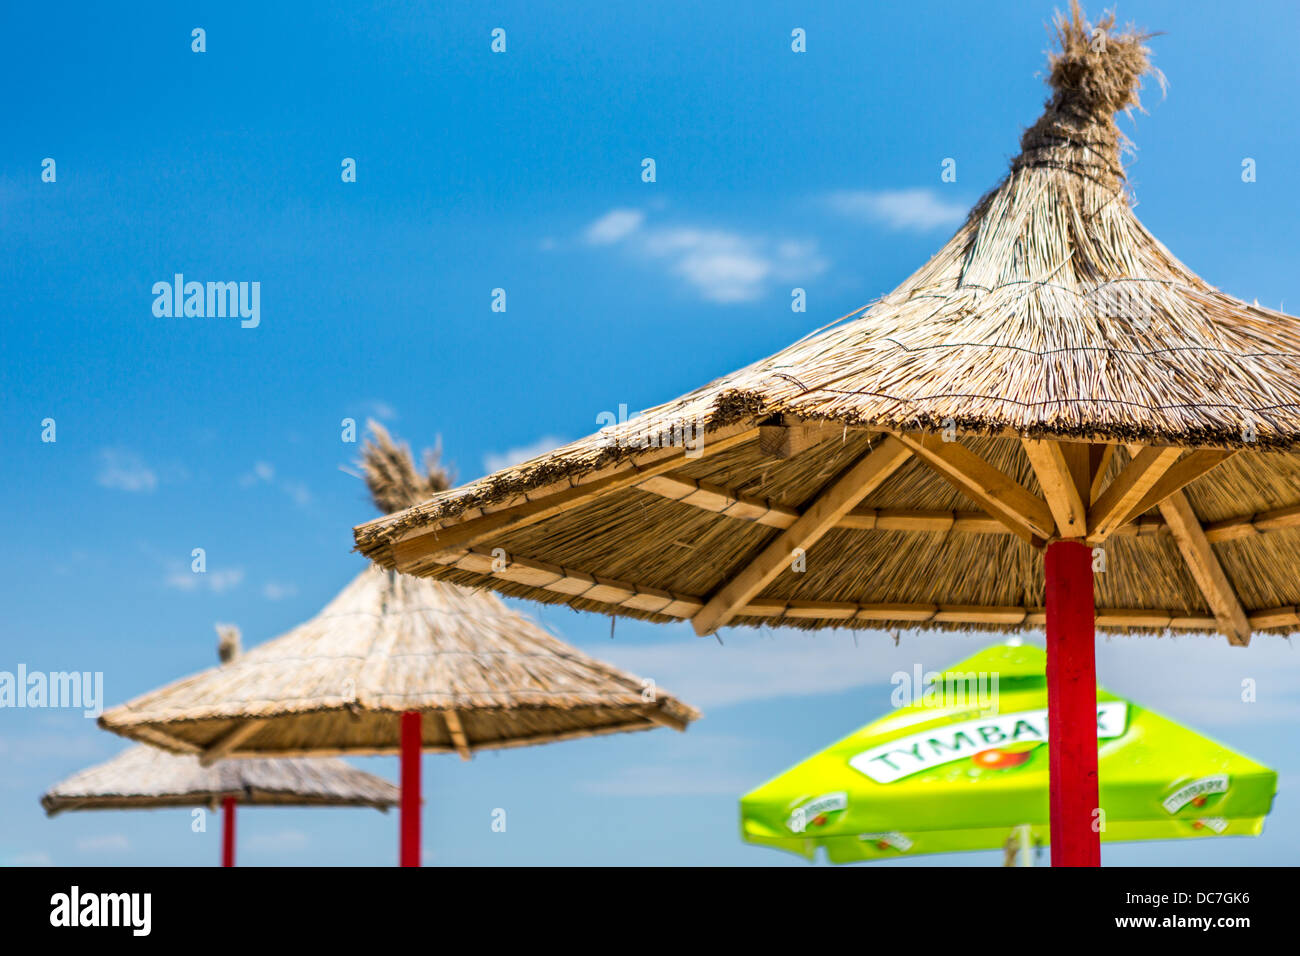 Row of straw umbrellas - Stock Image